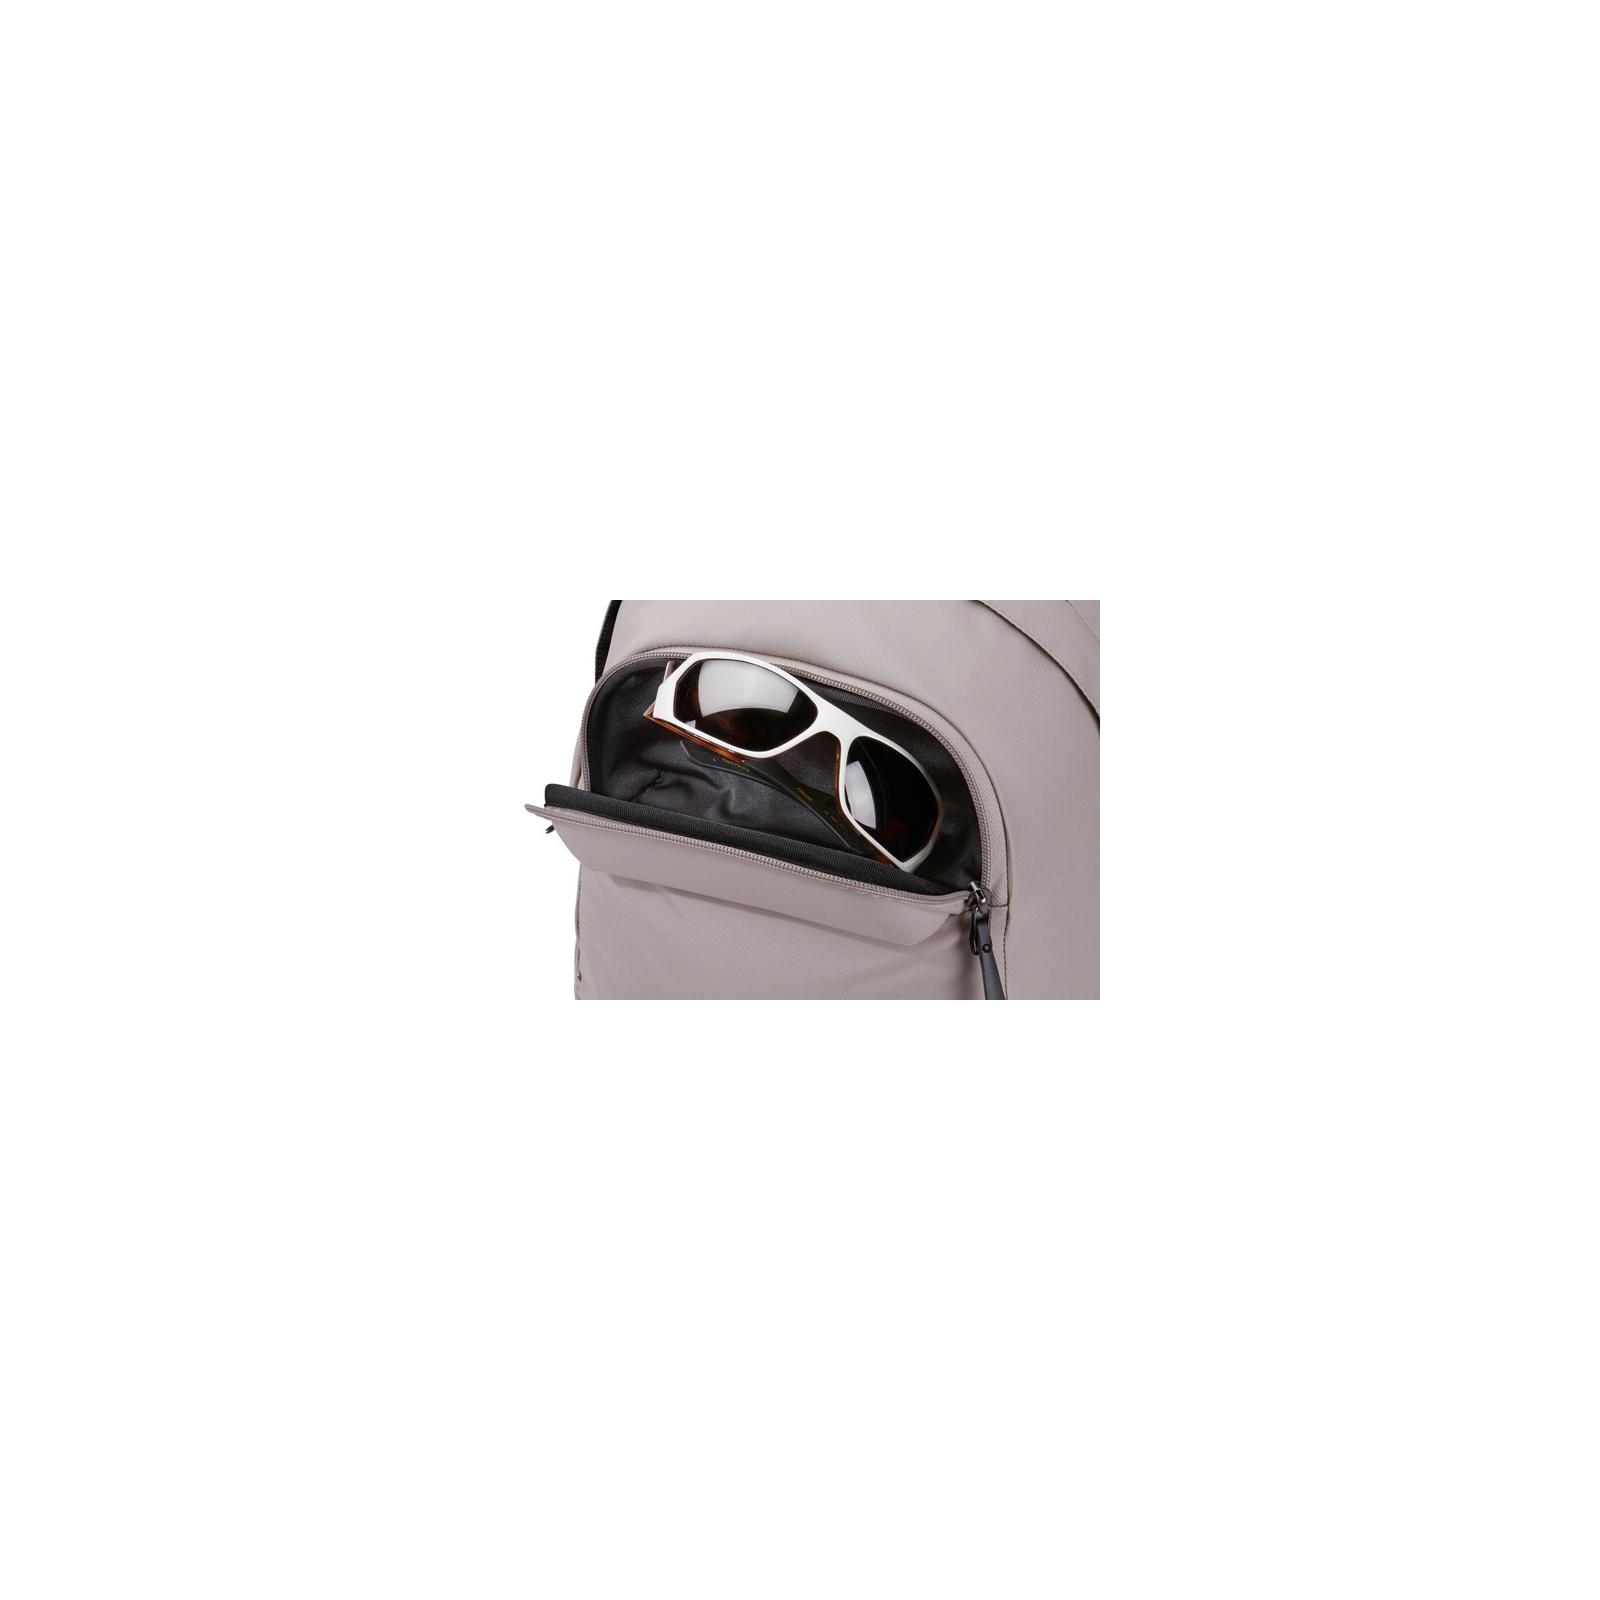 "Рюкзак для ноутбука Thule 15"" Departer 21L Corsair/Bluegrass TDMB-115 (3202905) изображение 5"